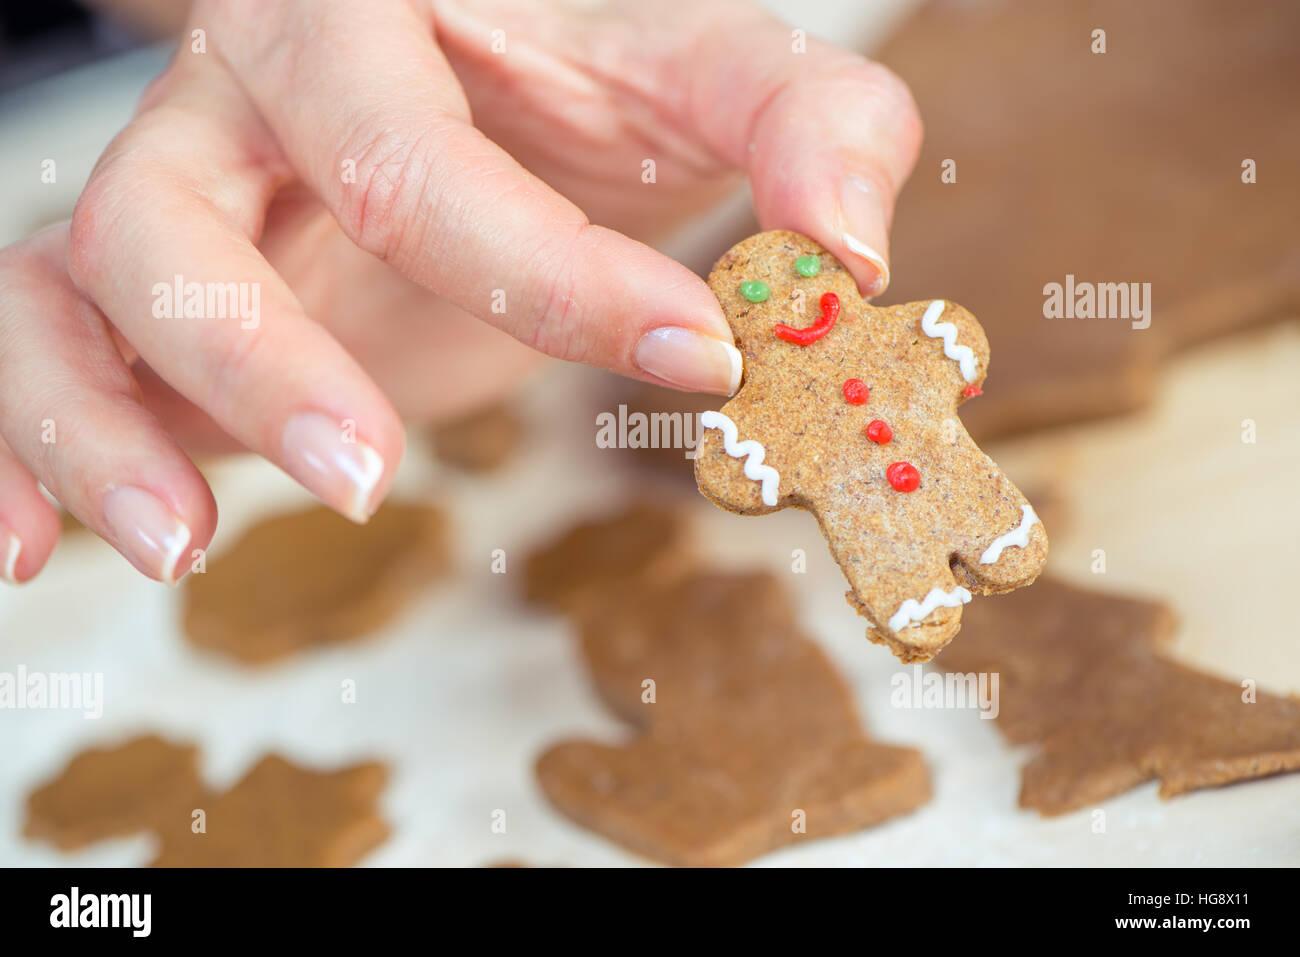 Vue partielle sur femme hand holding cute gingerbread man cookie Photo Stock